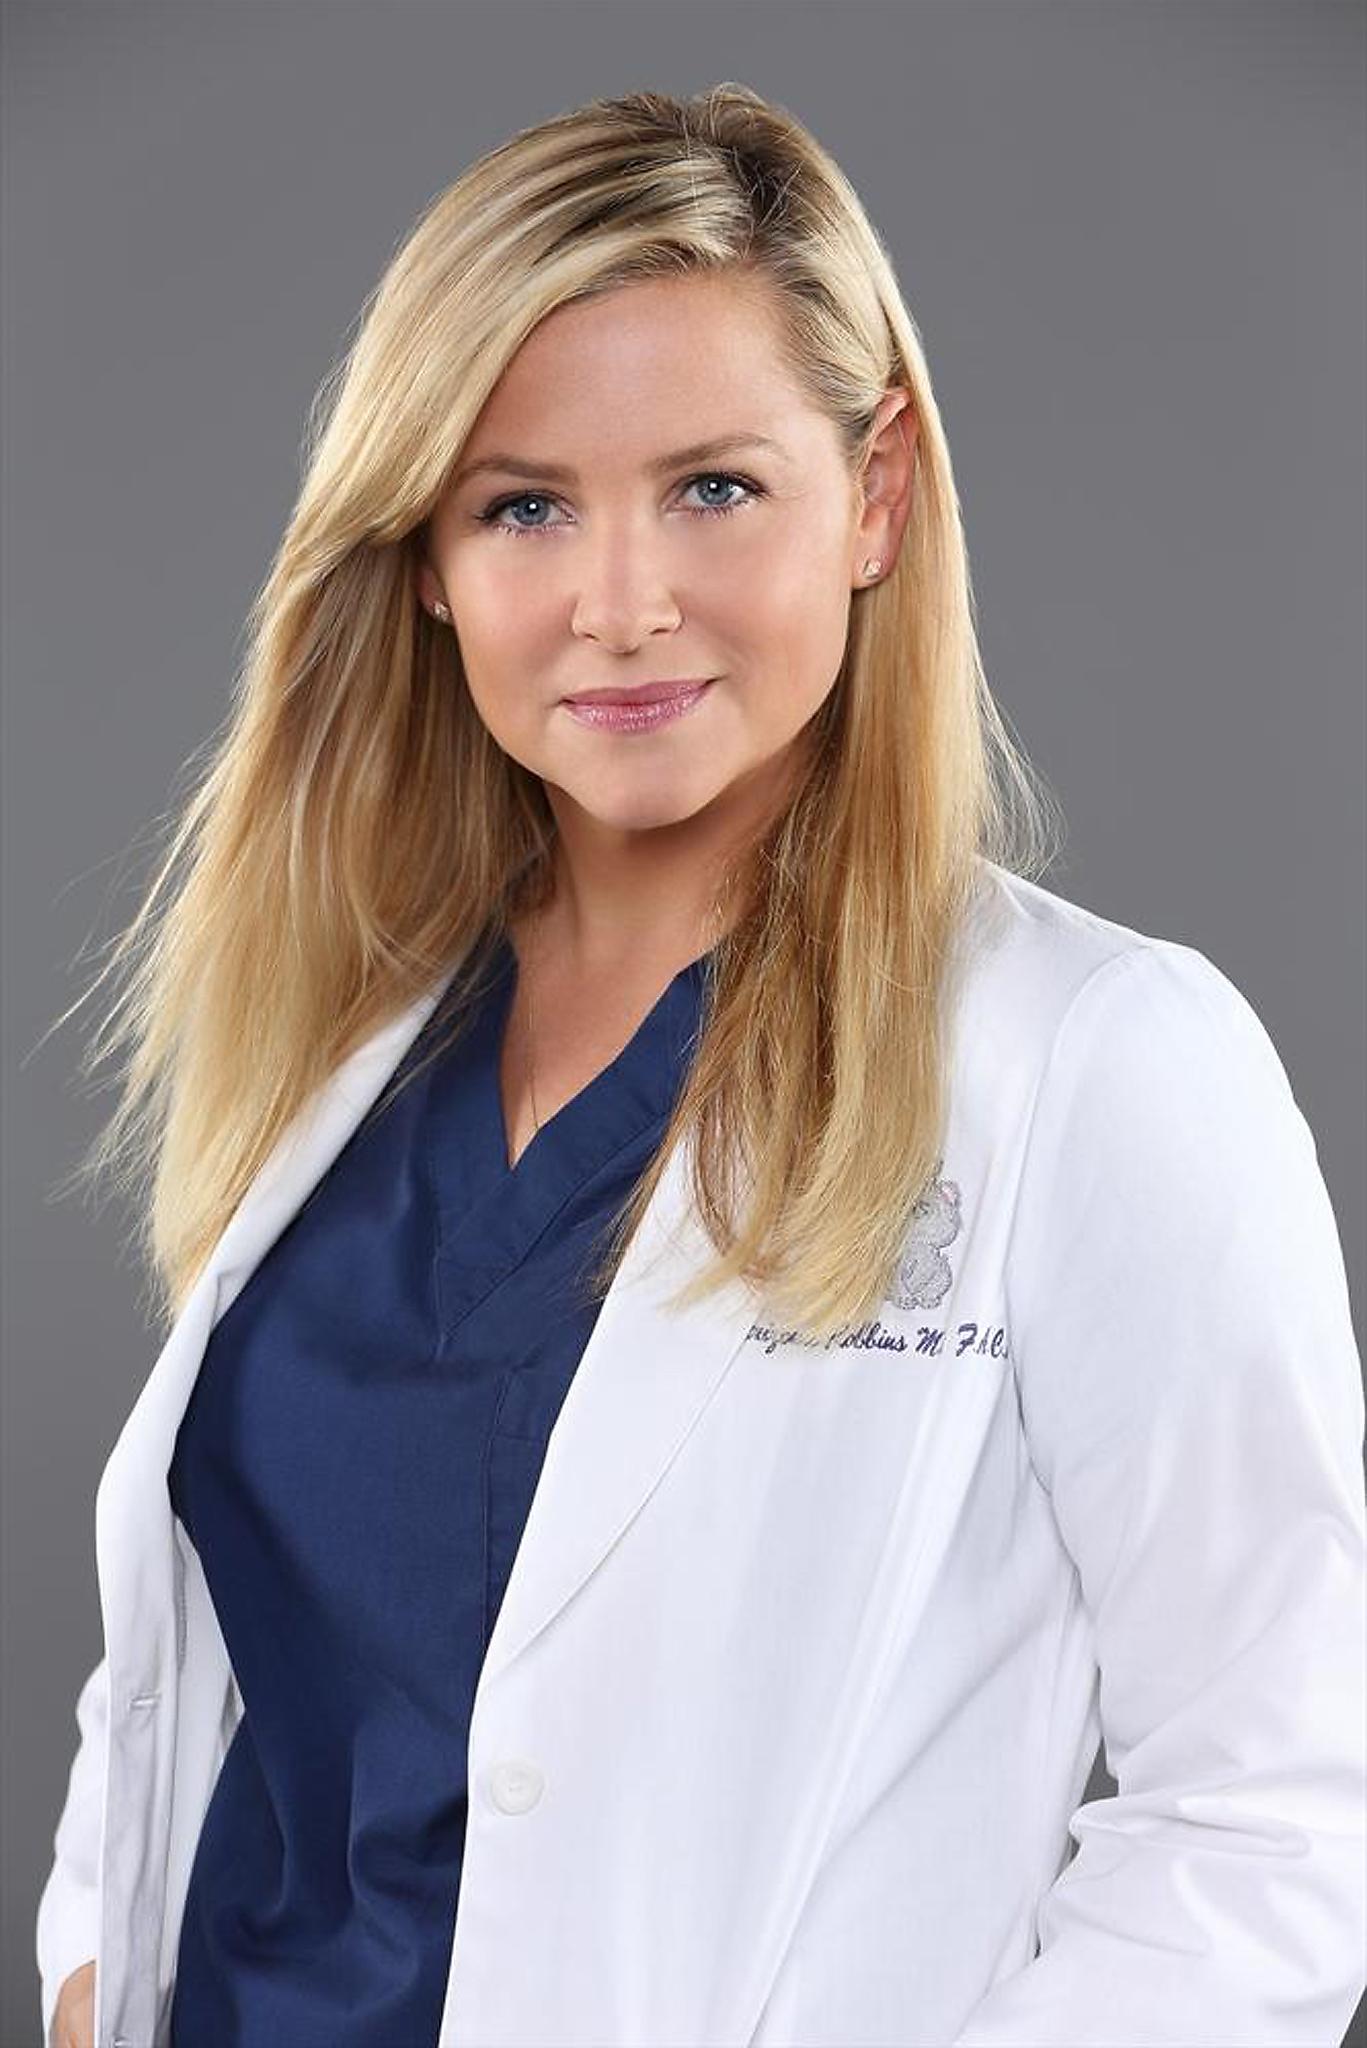 Greys-Anatomy-Audition-Jessica-Capshaw1.jpg